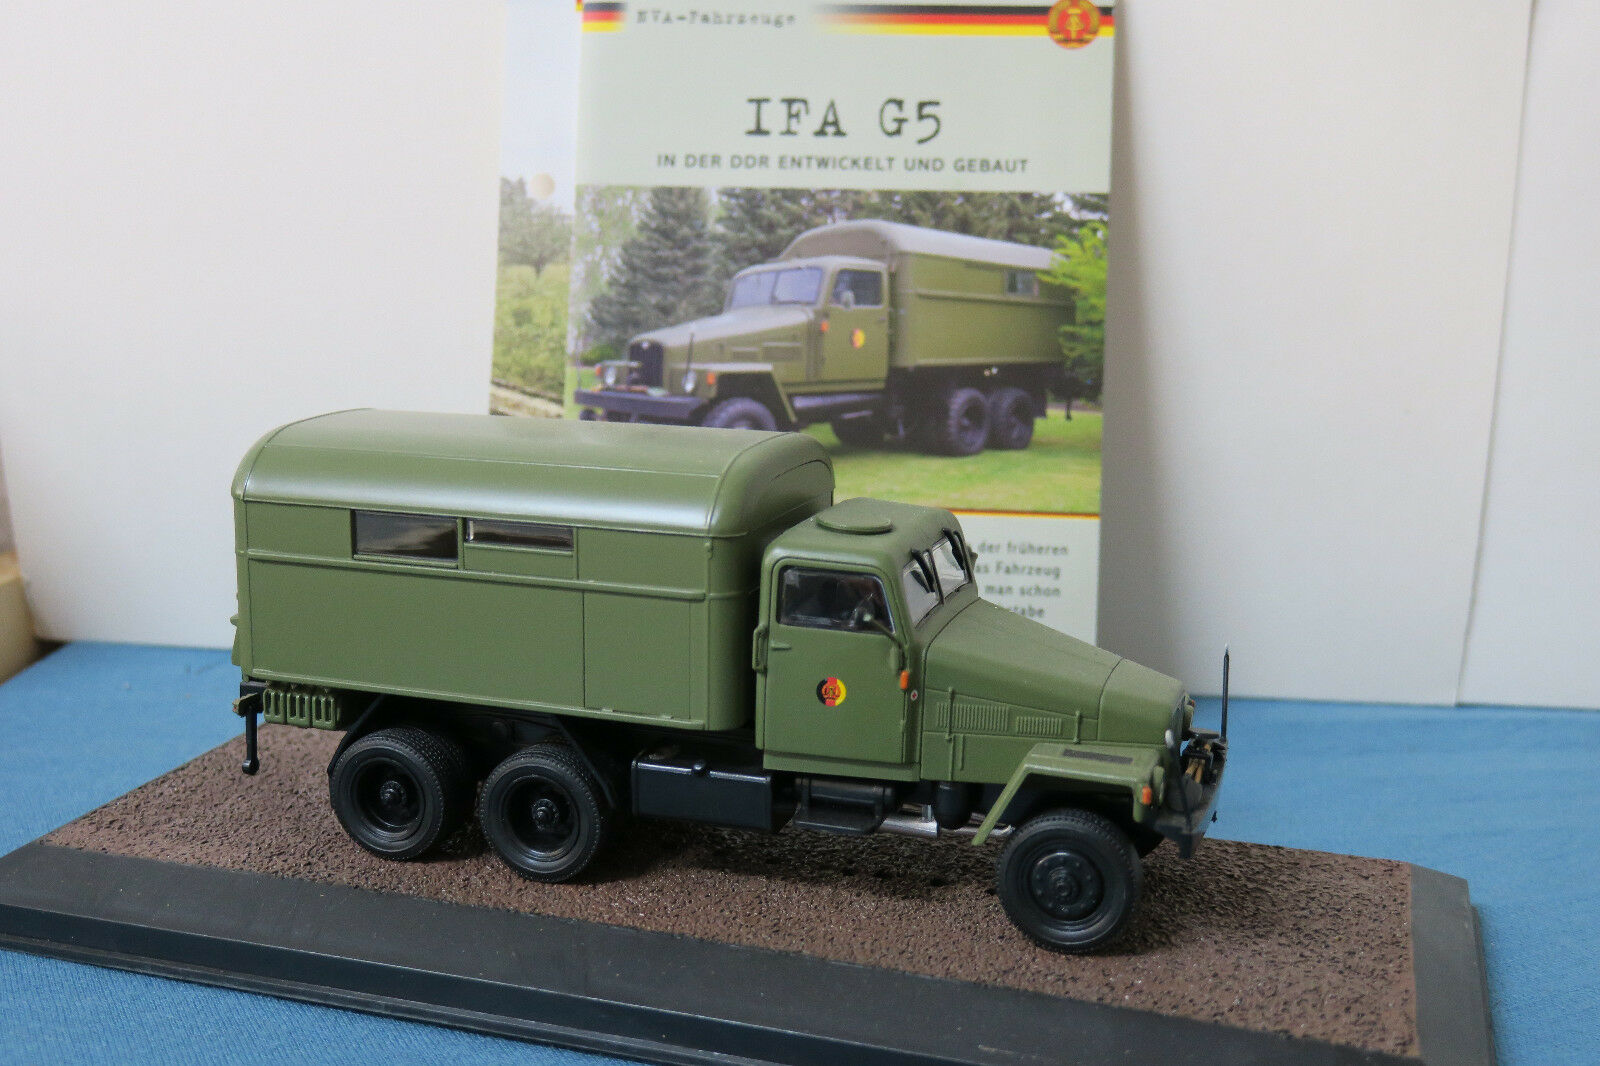 Atlas-NVA-IFA g5-Spécial Automobile - 1 43